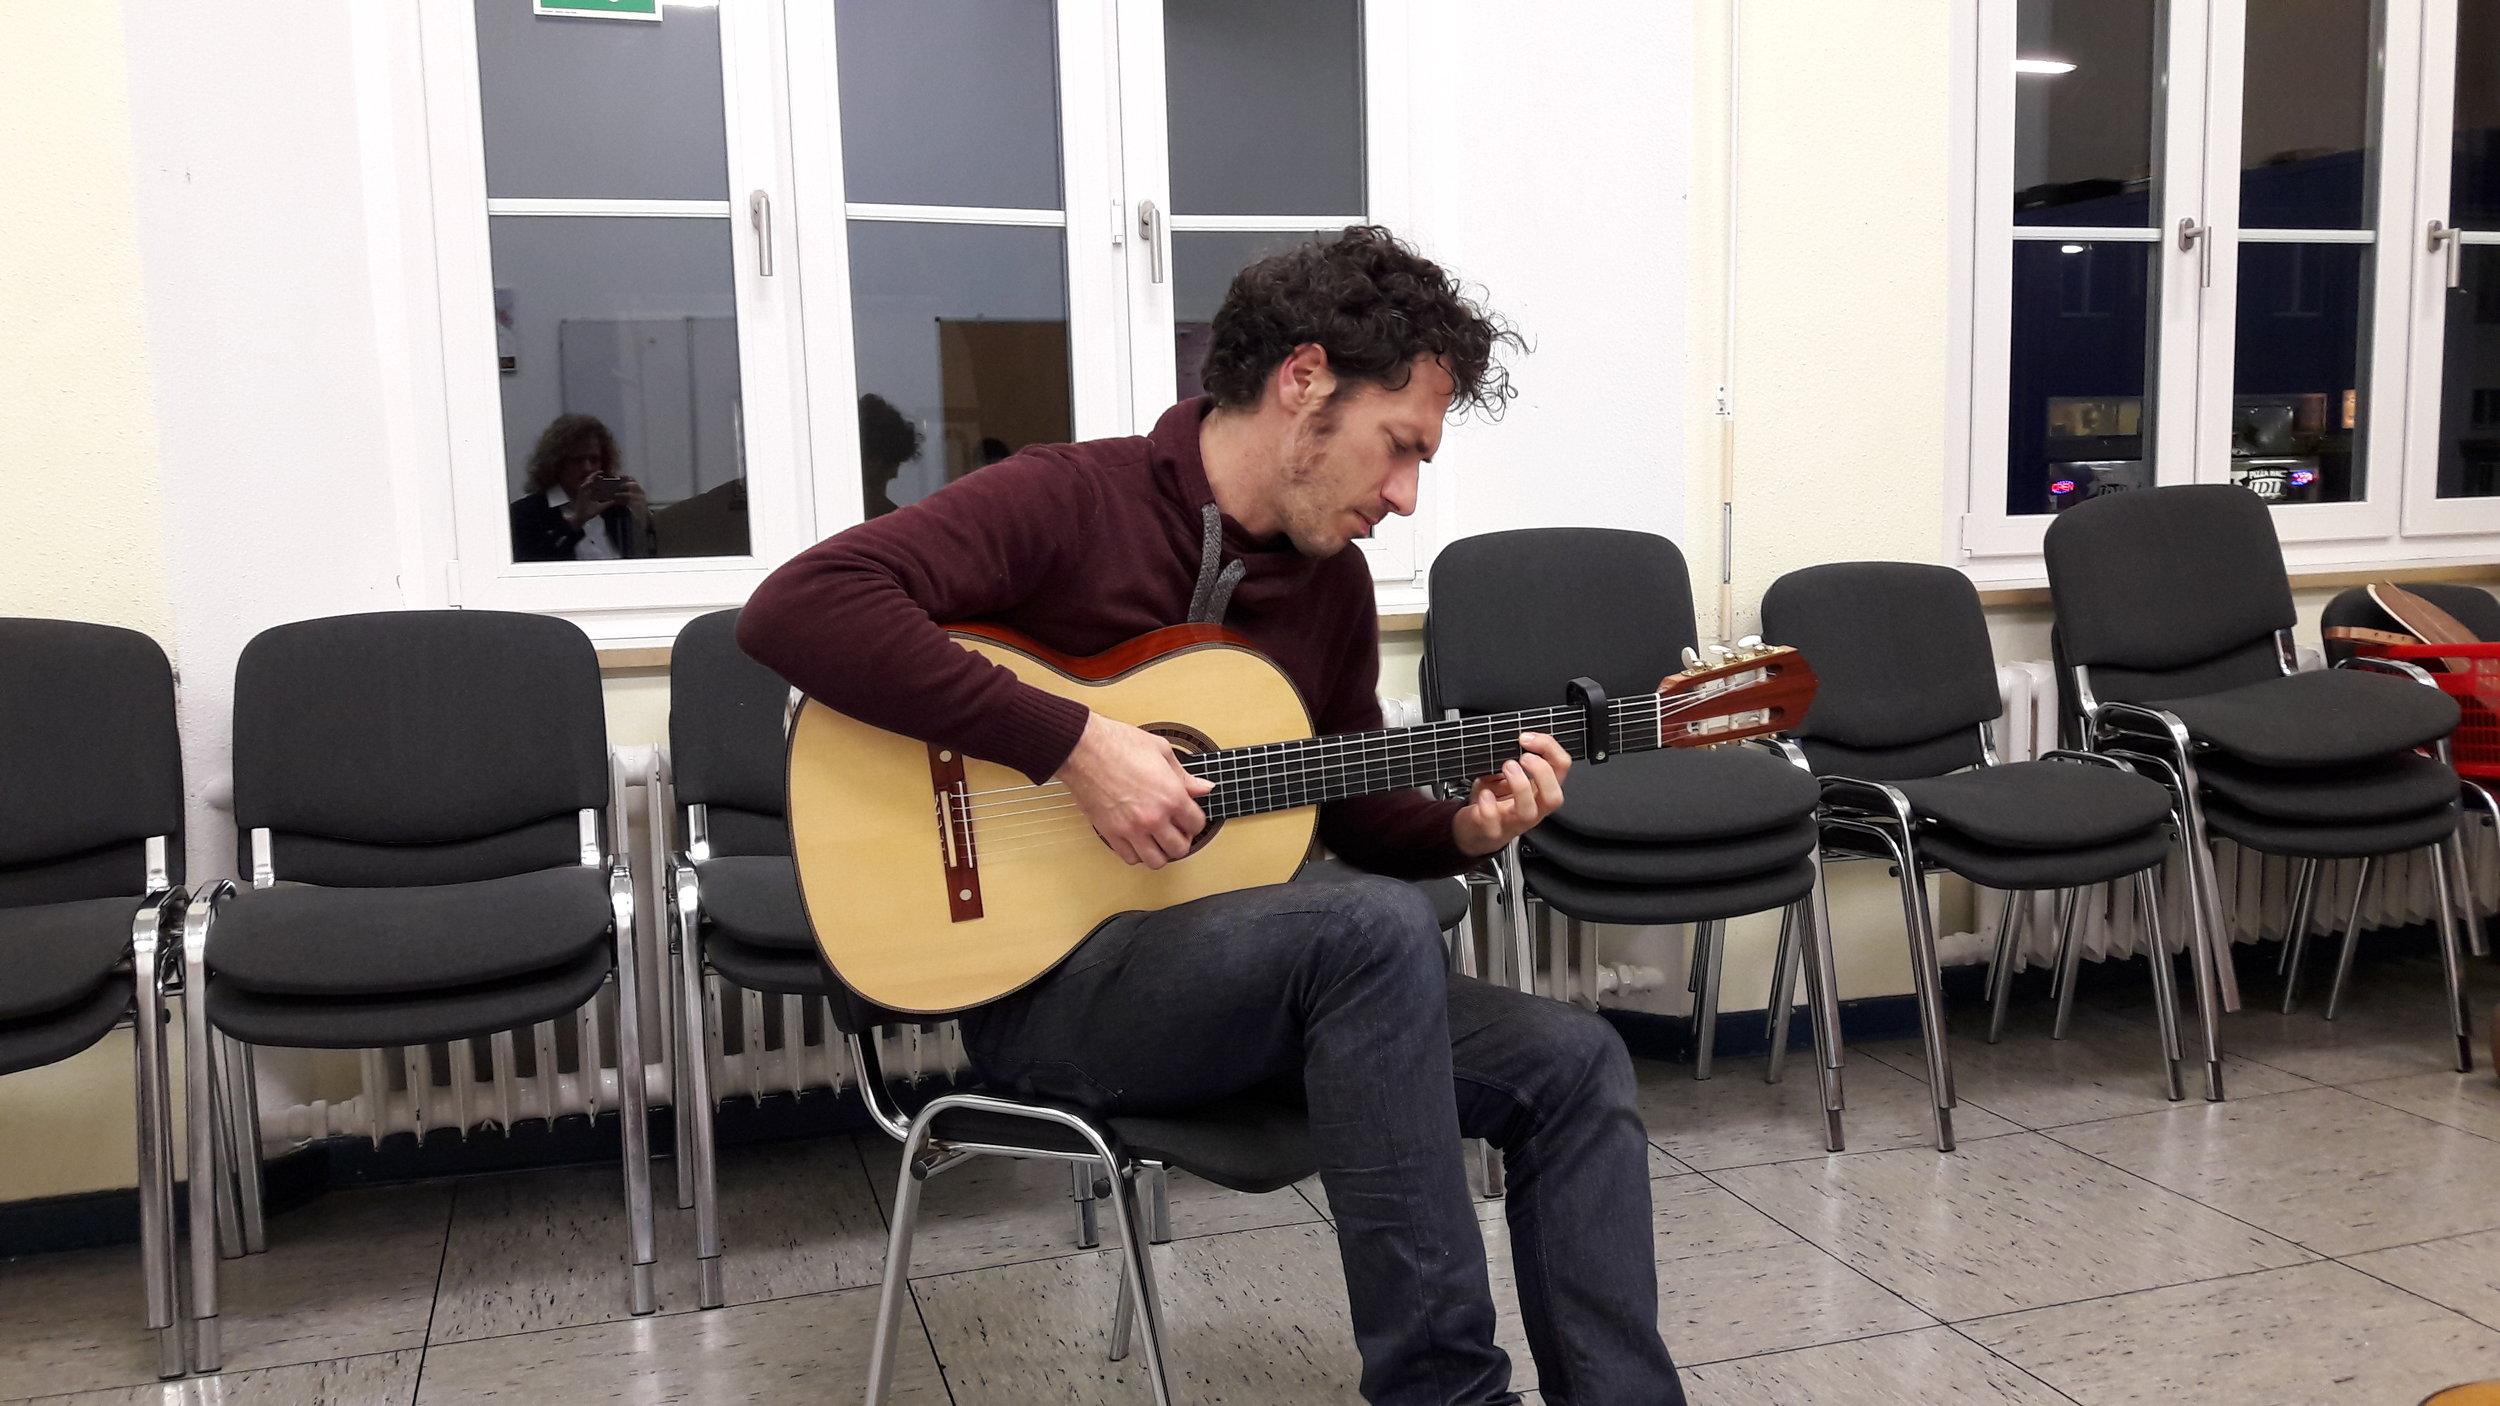 Maestro Reentko Dirks trying Den Toom Luthier guitar after the Talk.